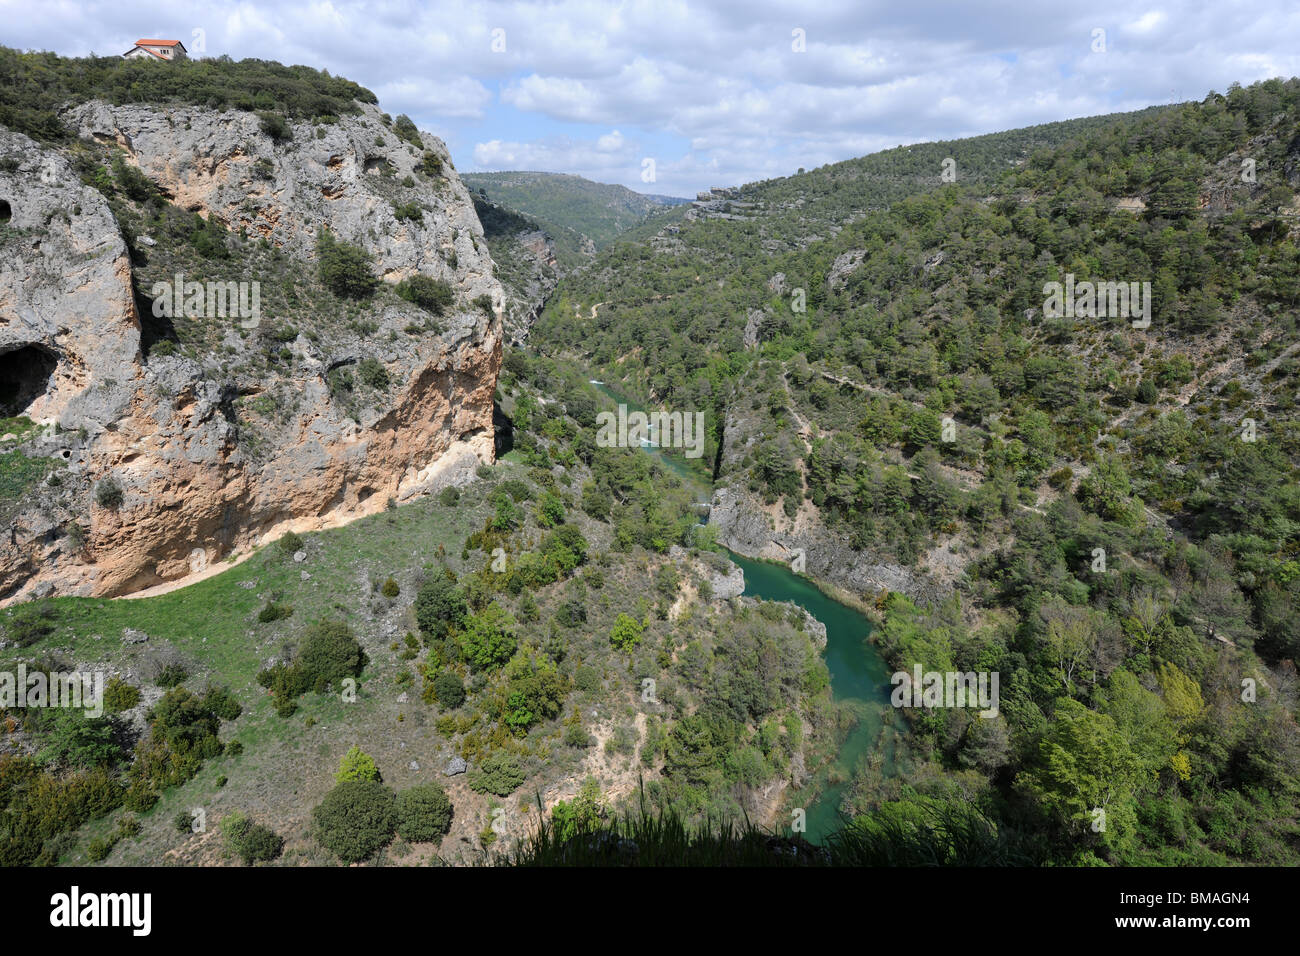 Jucar River / Rio Jucar, Serrania de Cuenca, Castile-La Mancha, Spain - Stock Image